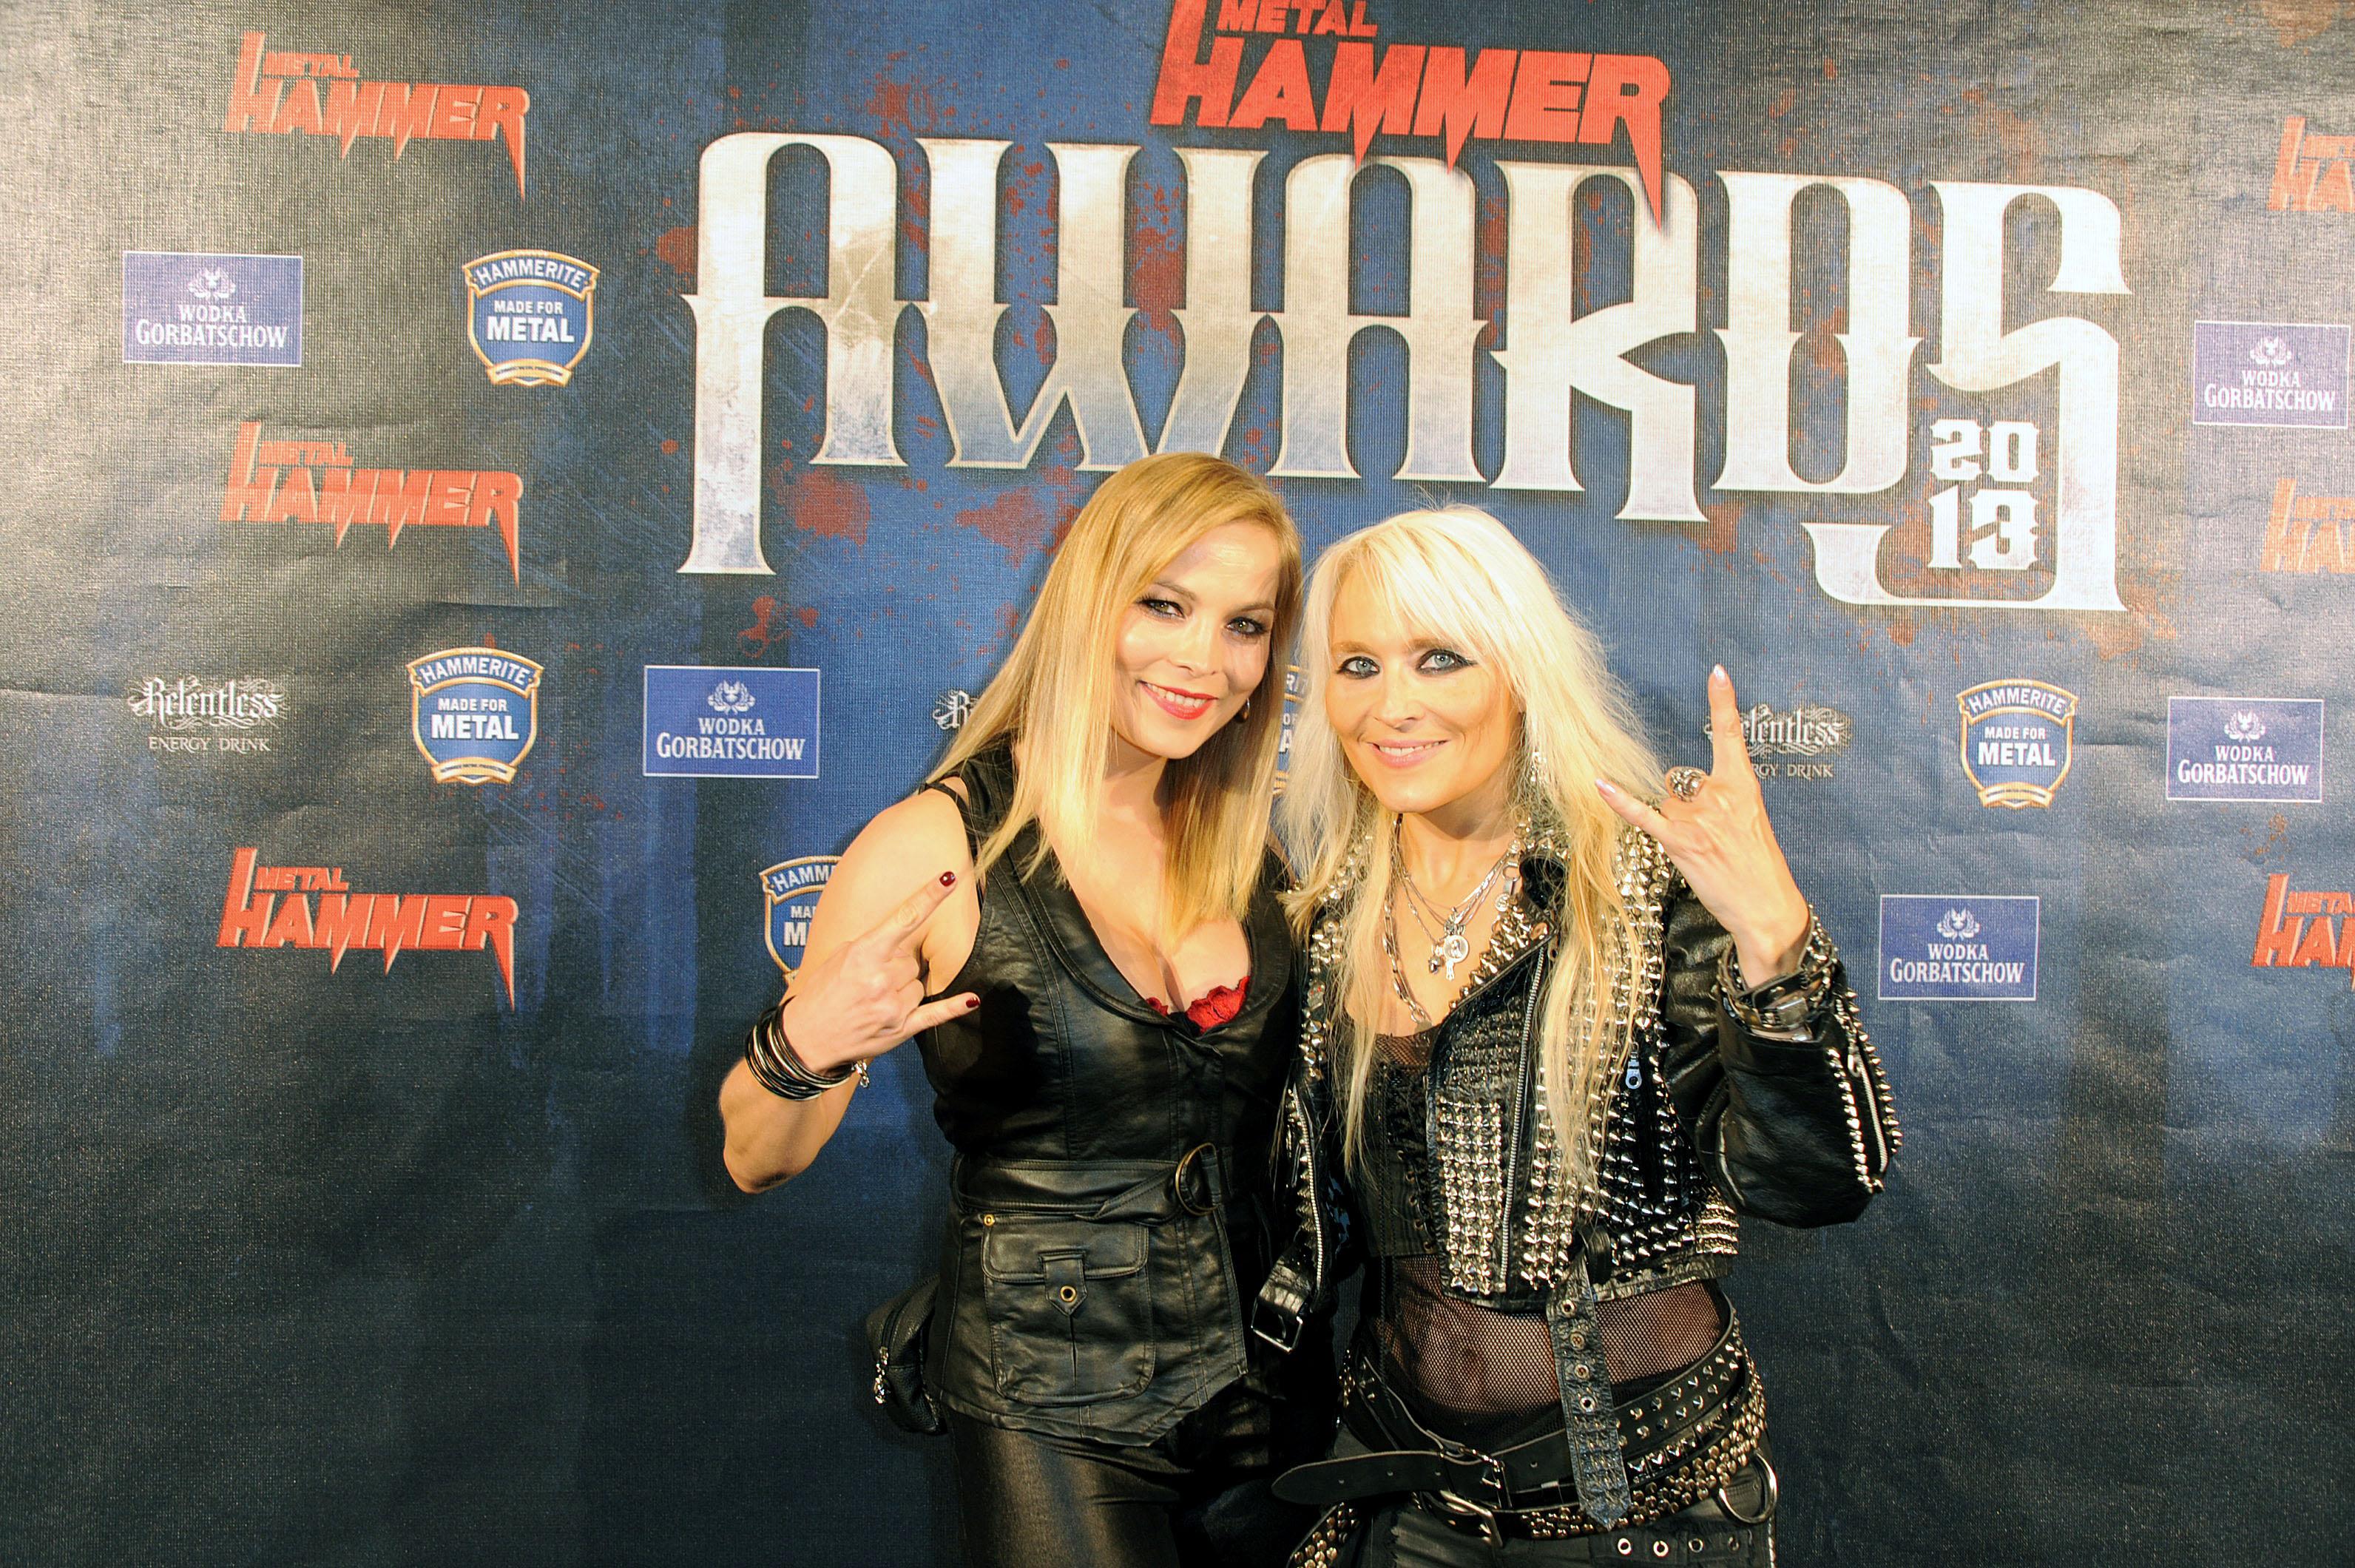 Regina_Halmich_20130913_Metal_Awards_036.jpg